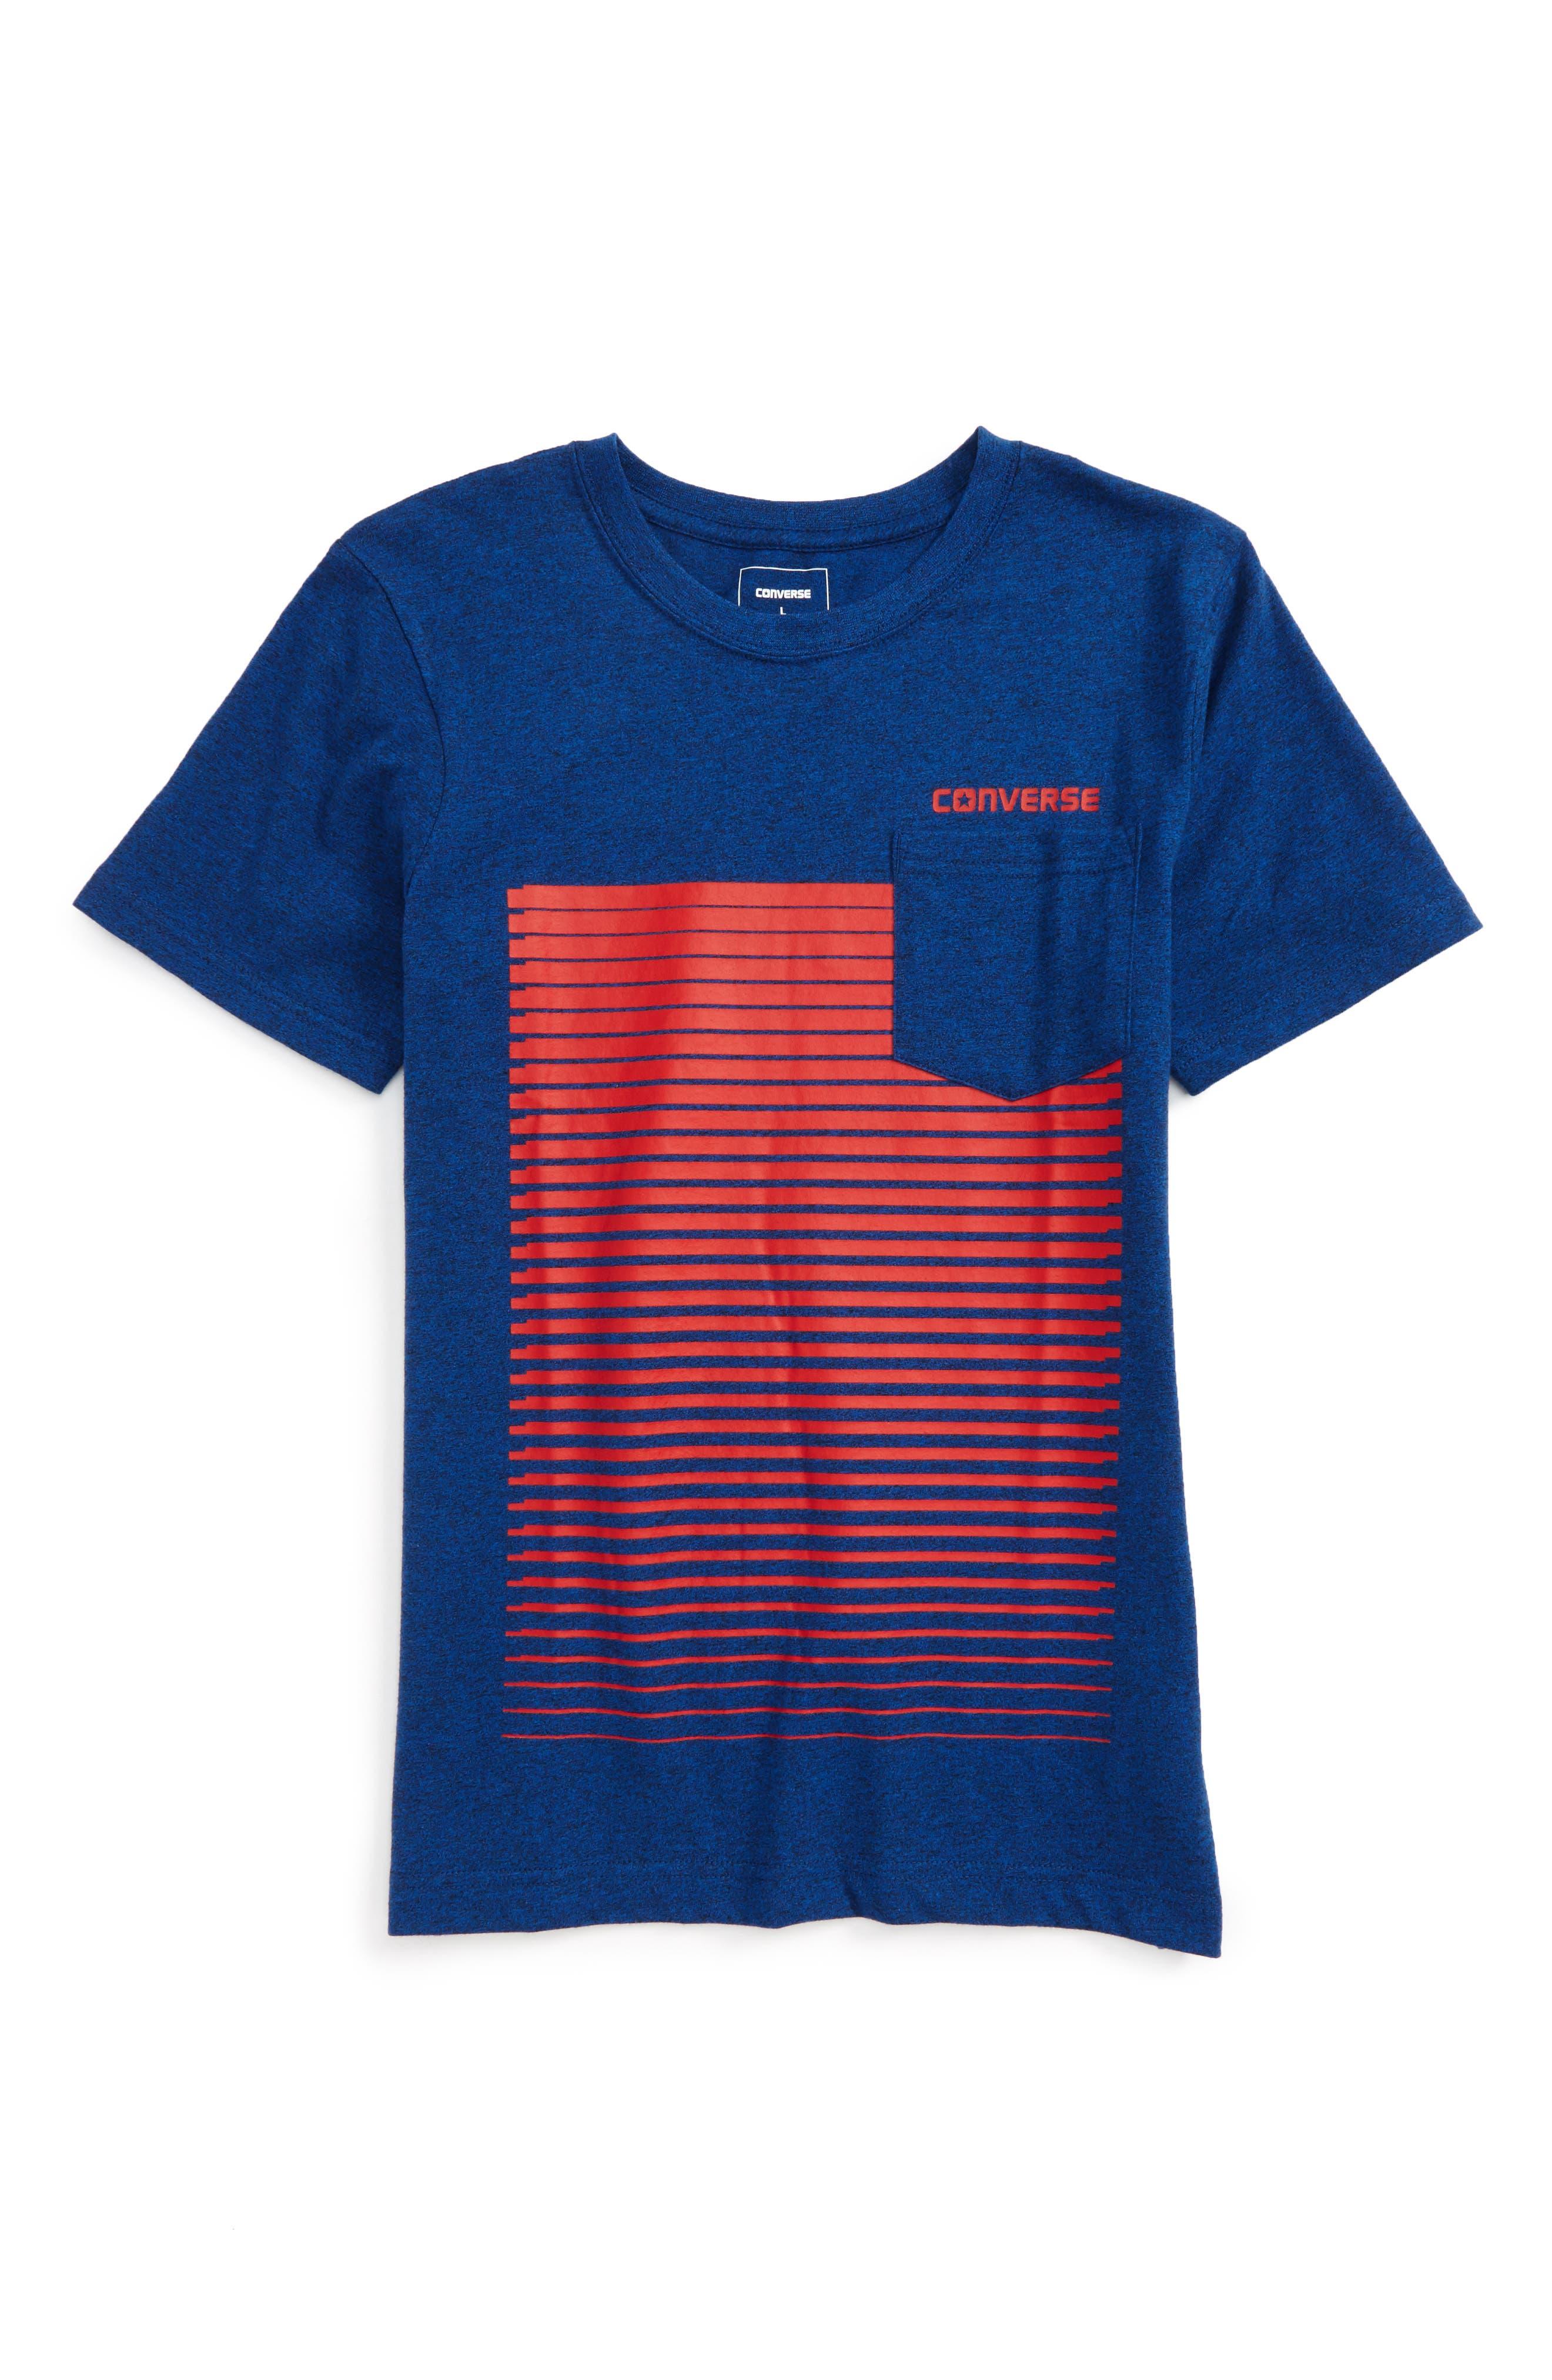 Alternate Image 1 Selected - Converse Linear Ombré Pocket T-Shirt (Big Boys)